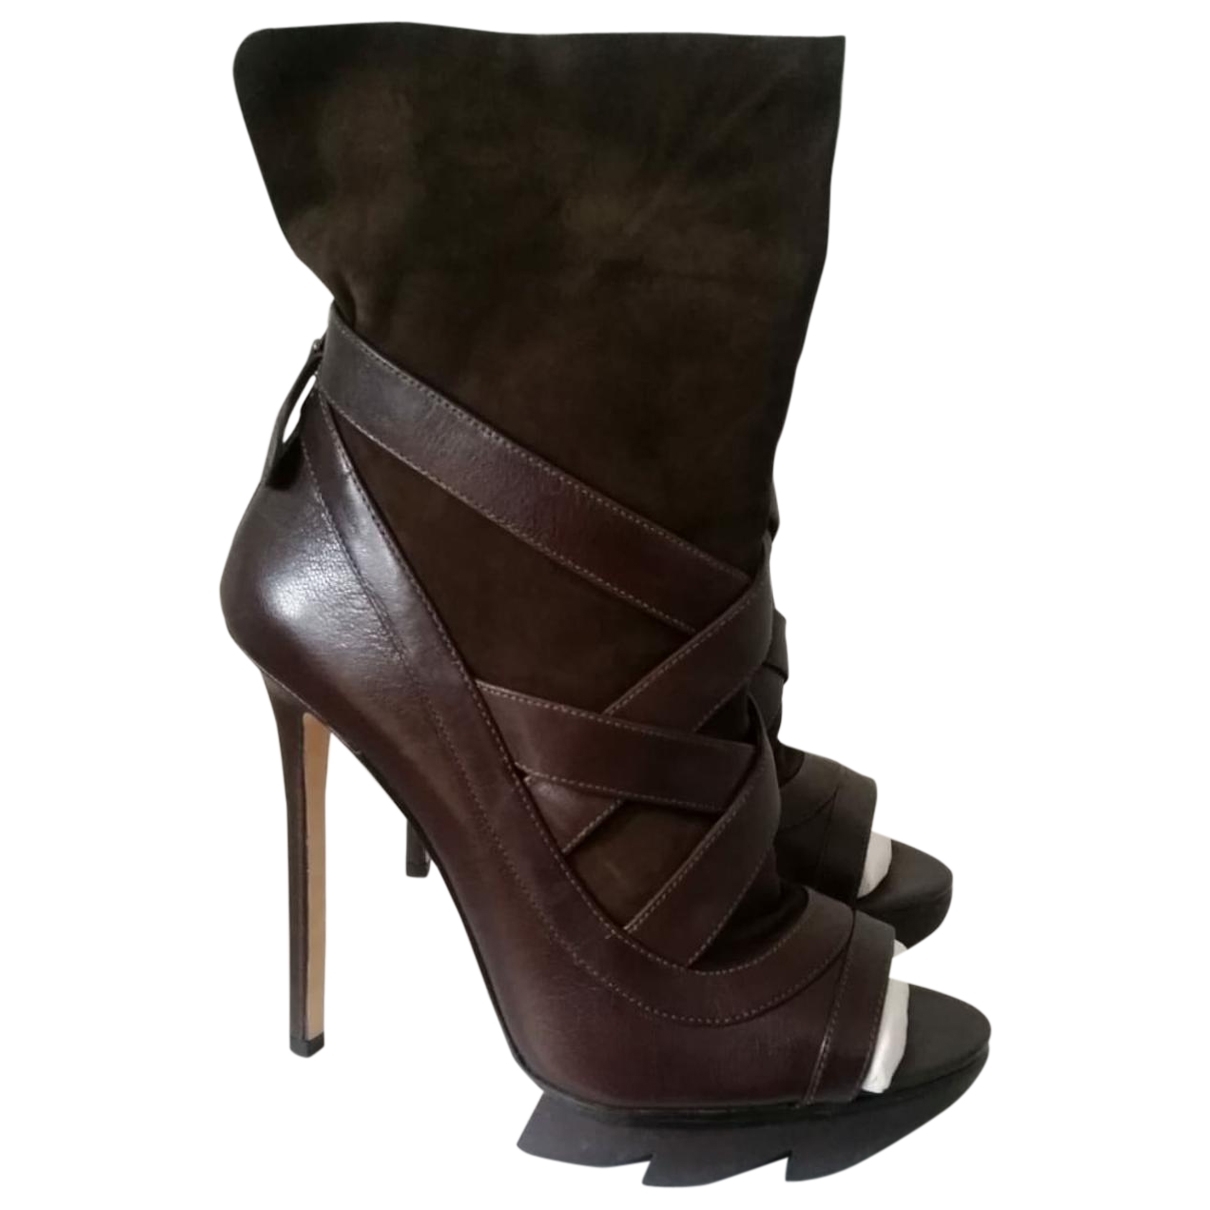 Camilla Skovgaard \N Brown Suede Ankle boots for Women 40.5 EU